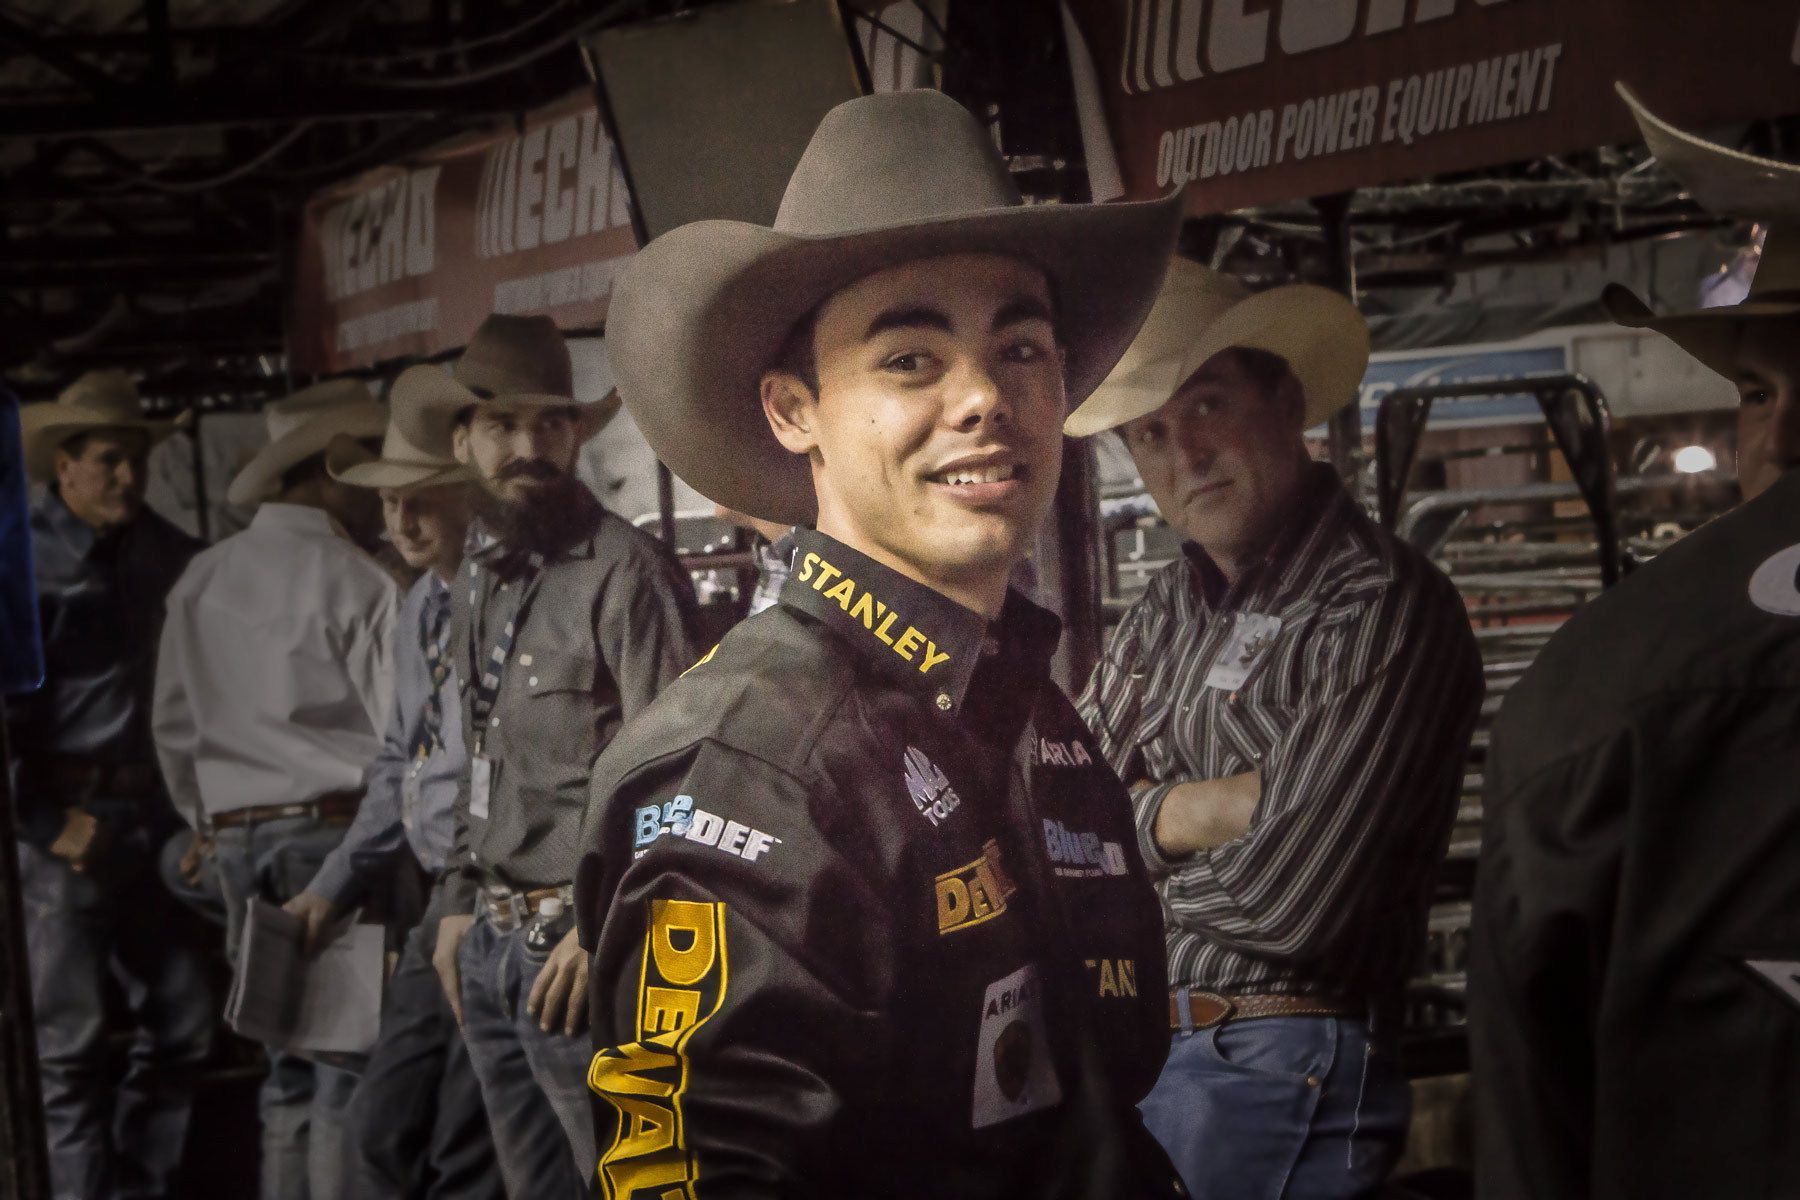 Happy Bull rider